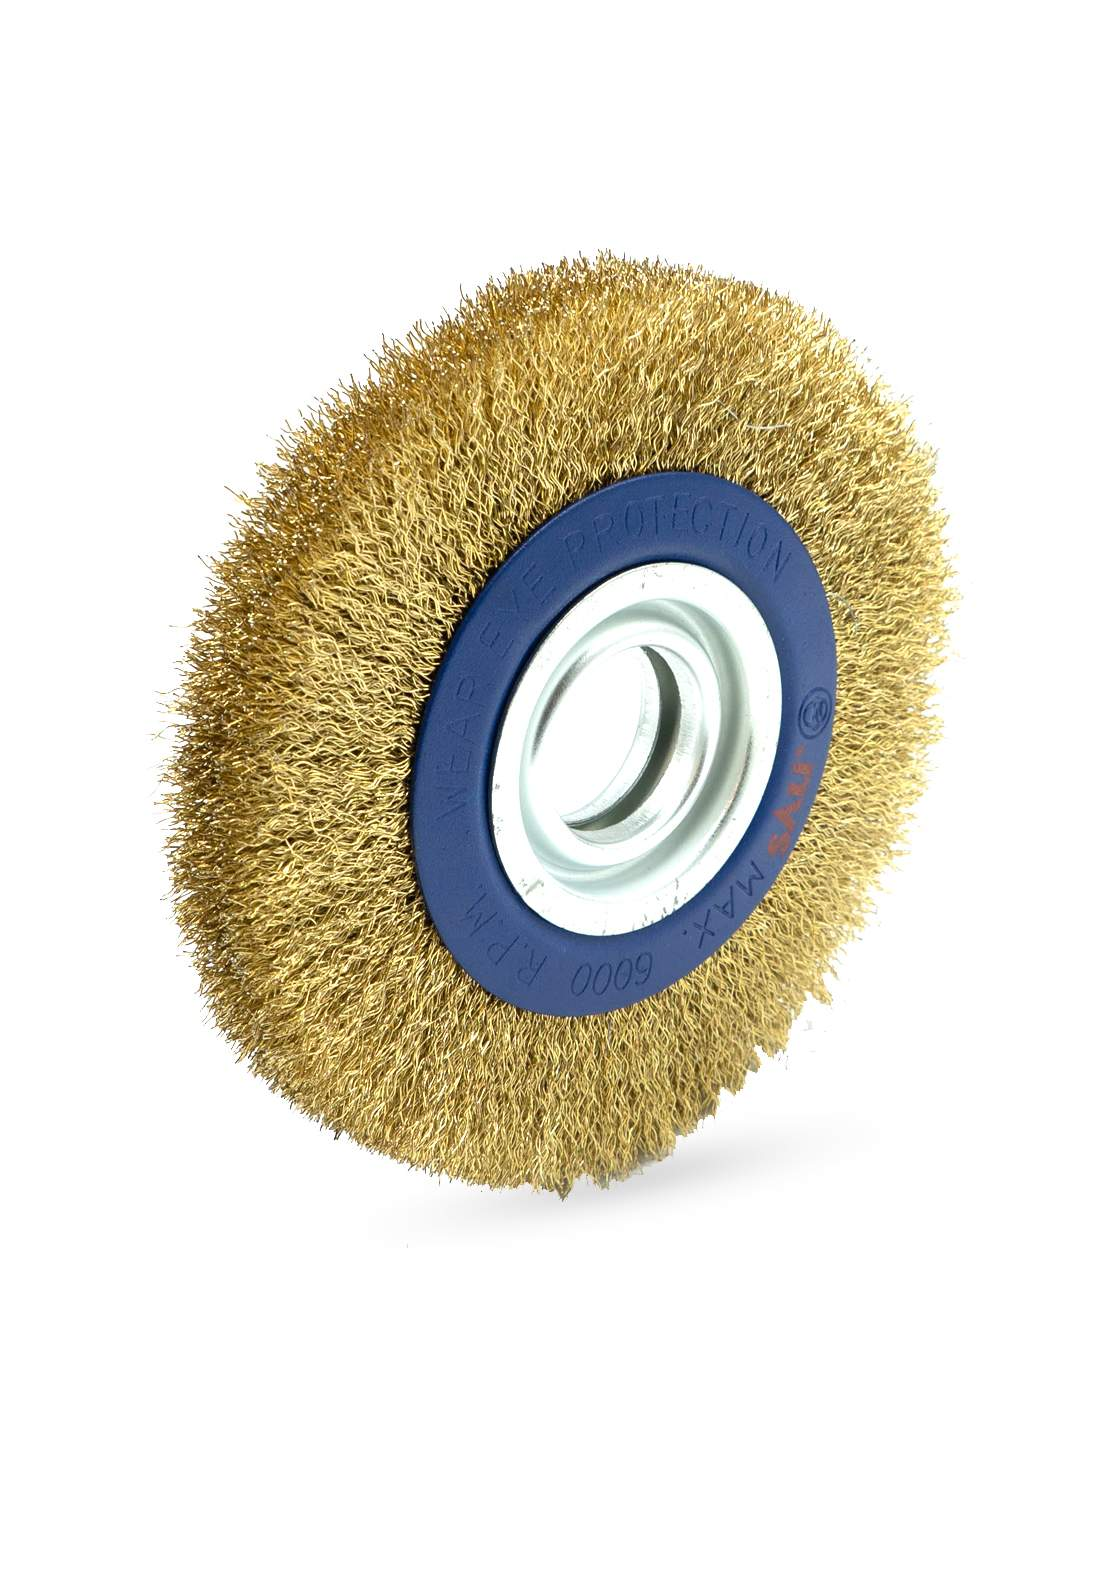 Sali 7231 Tools Wire Brush 150 mm فرشاة تنظيف الاسطح المعدنية